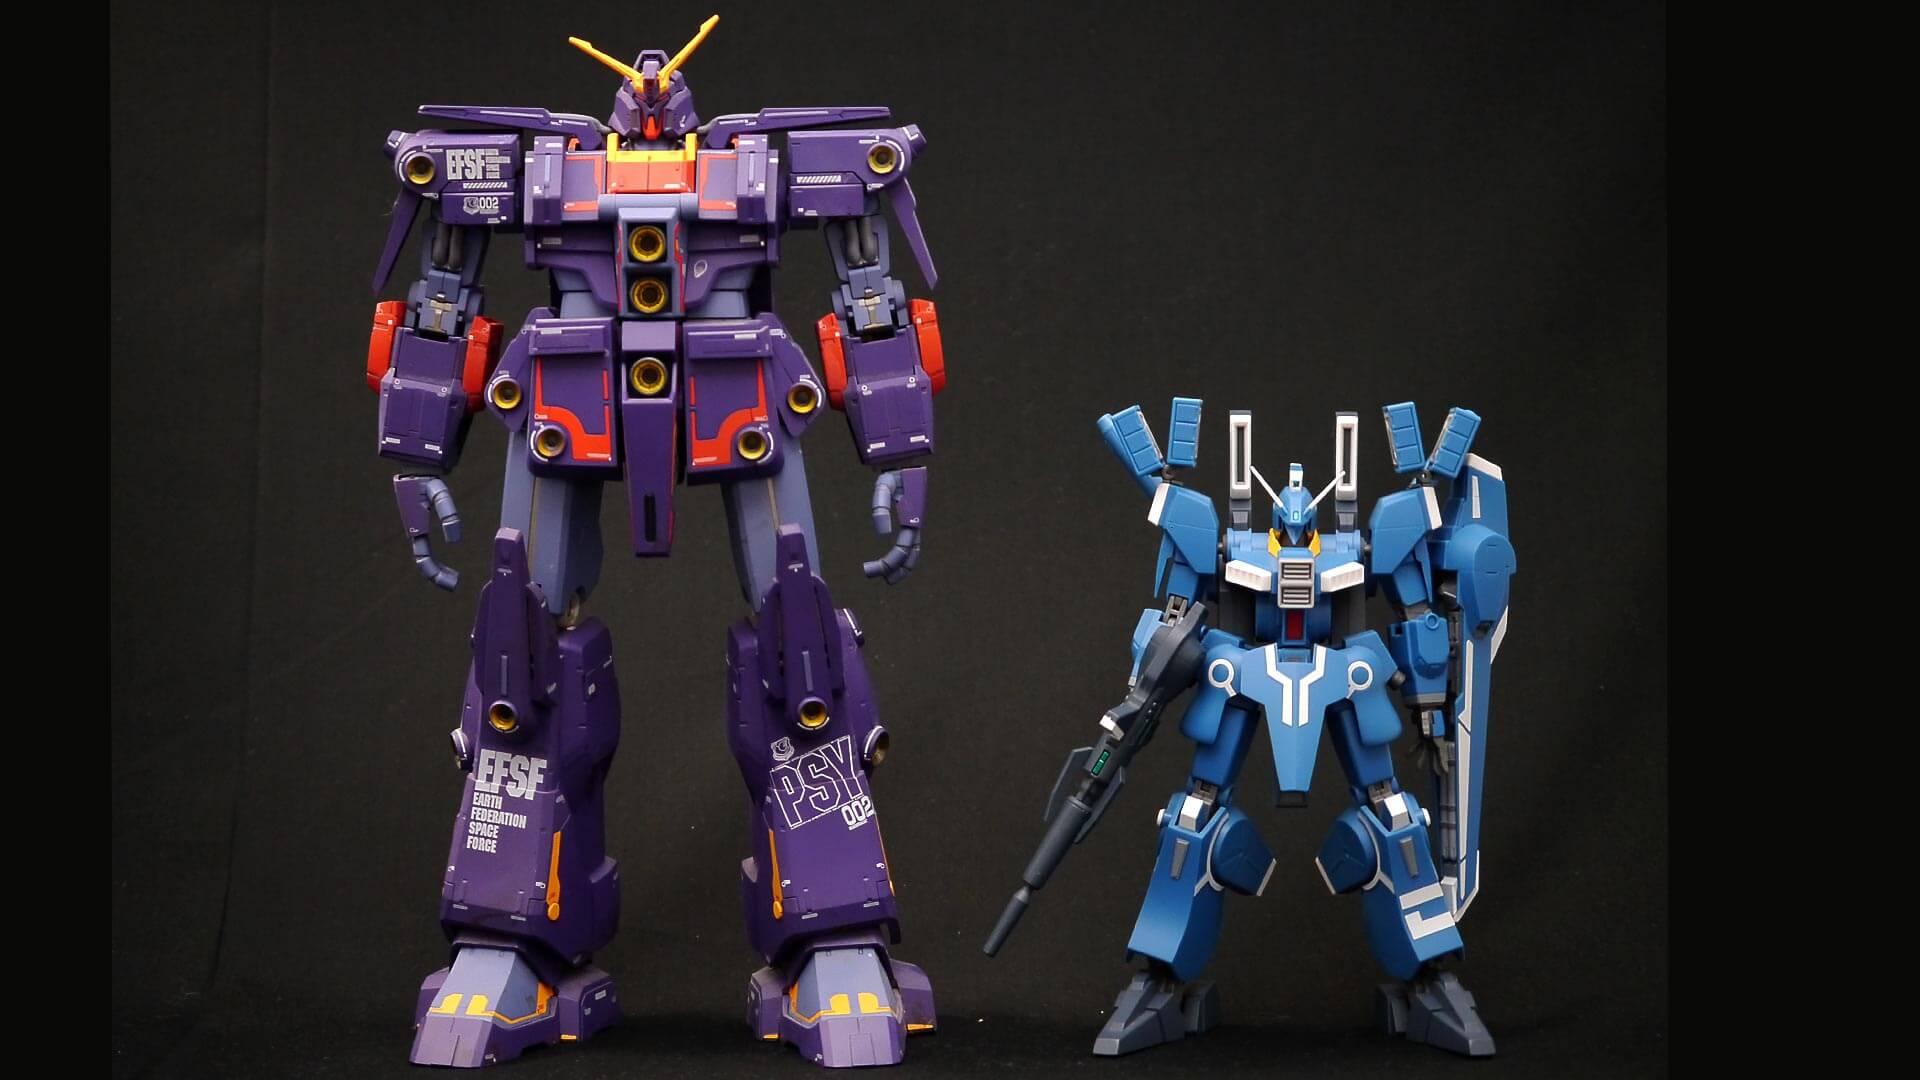 ROBOT魂 ガンダムMk-V サイコガンダムMk-II 比較